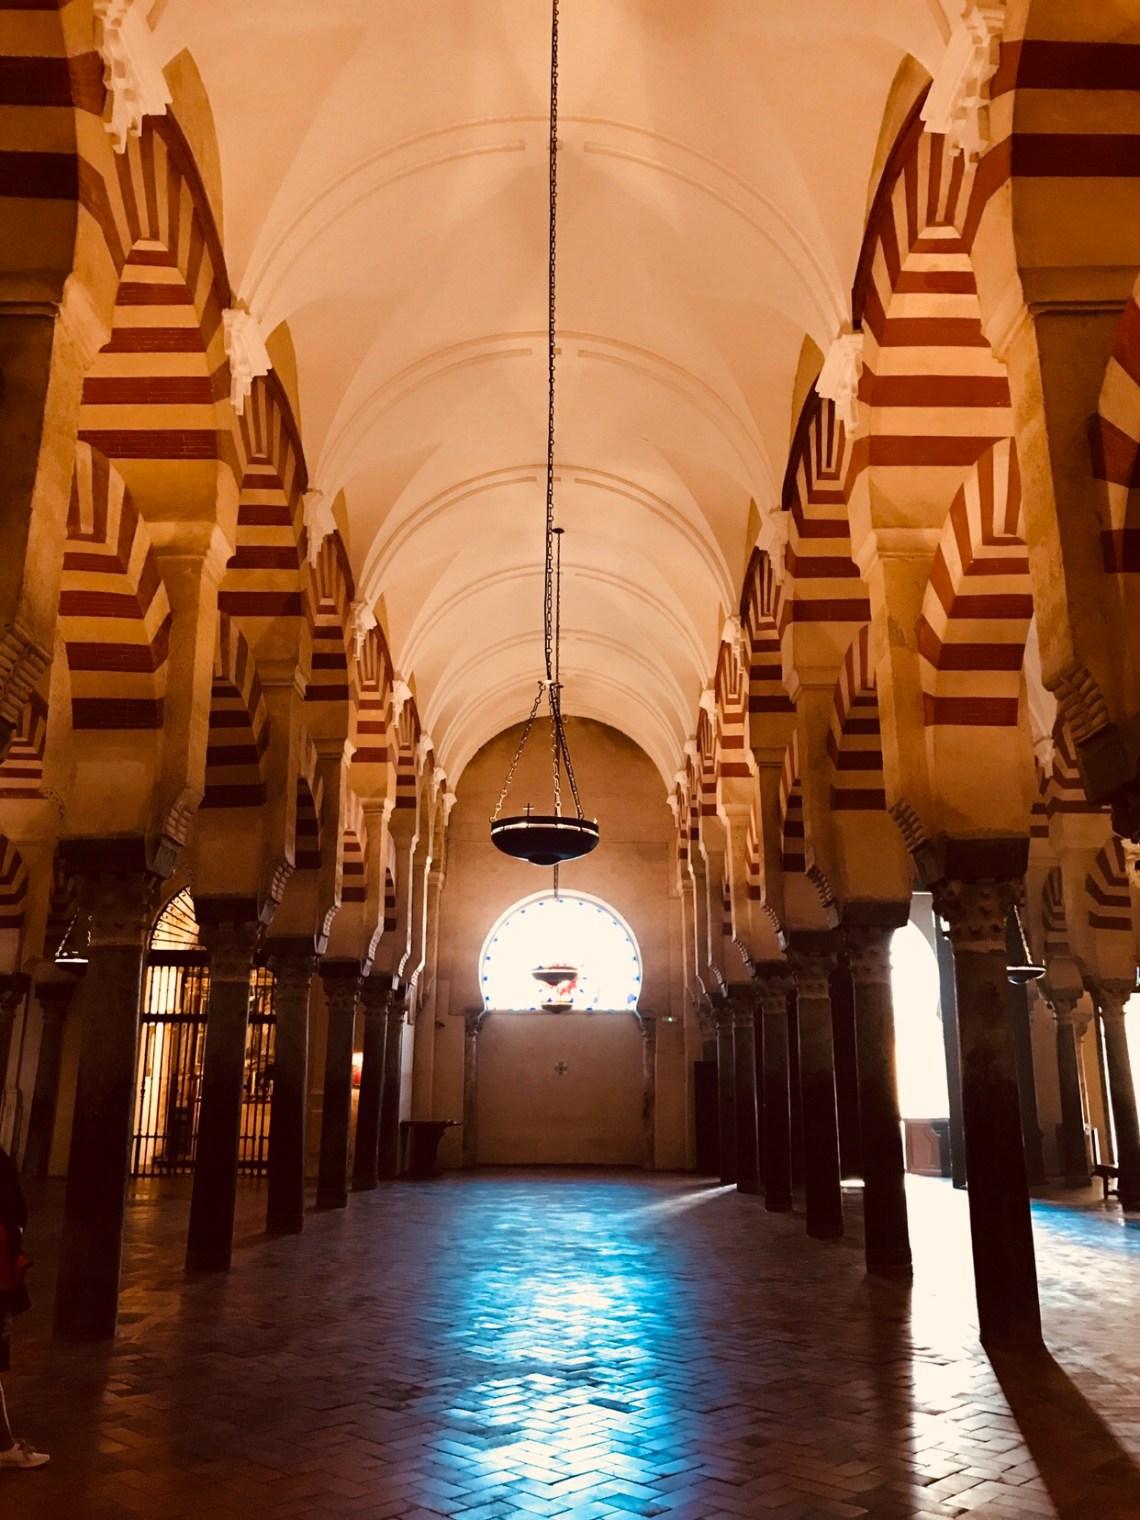 The oil lamp inside the Mesquita.